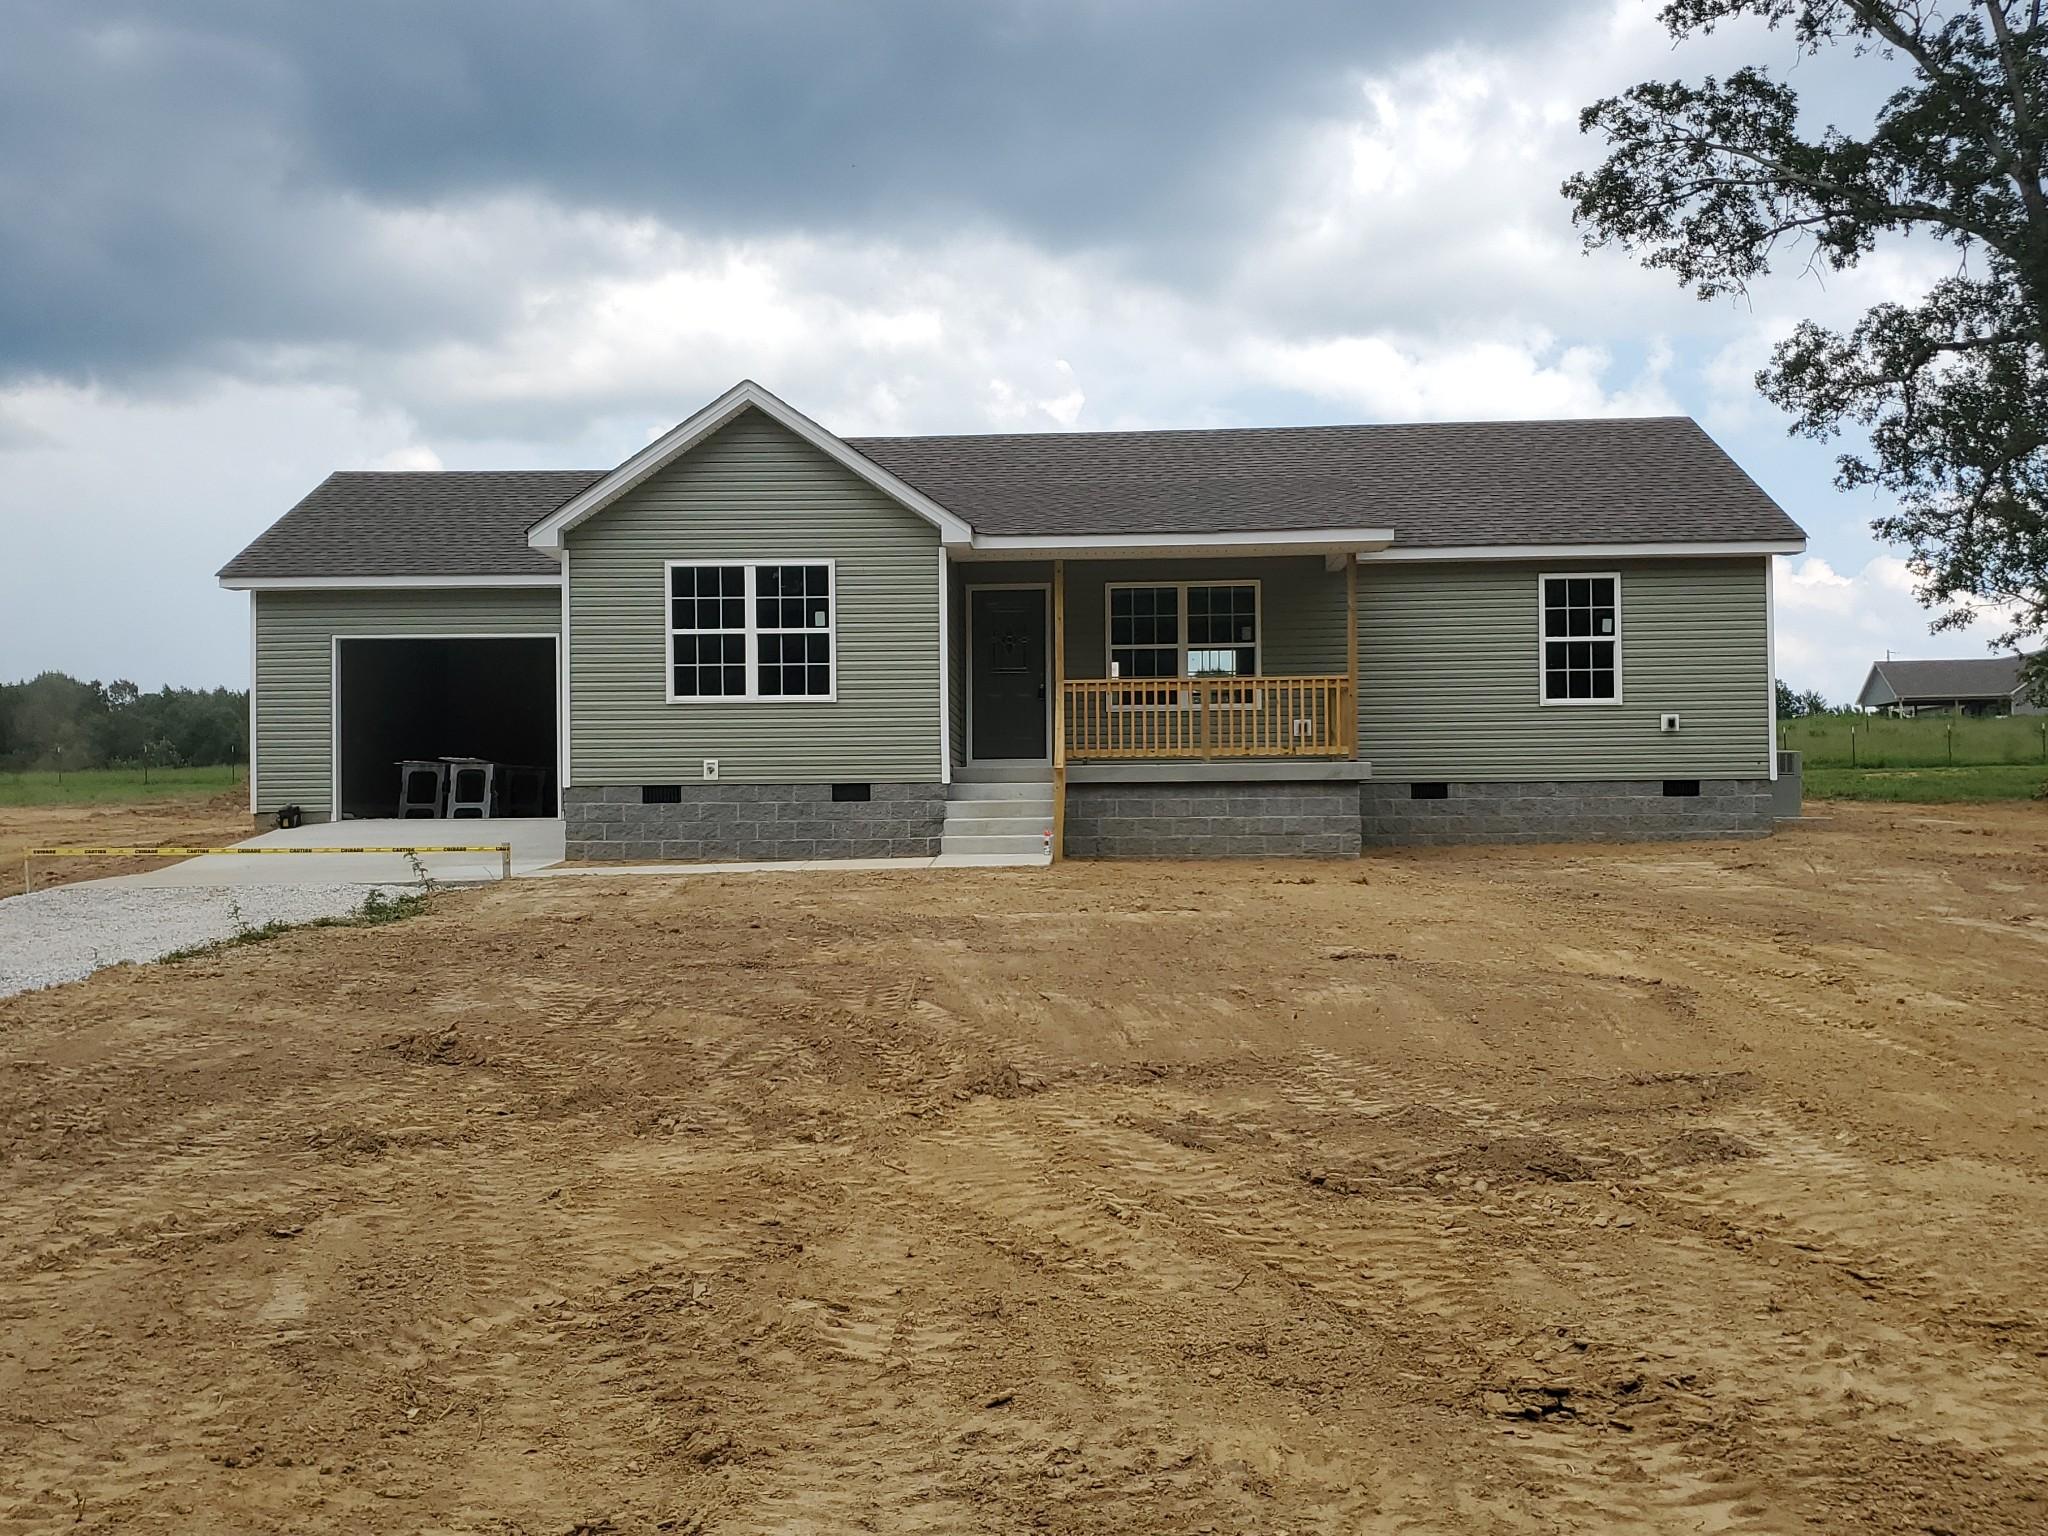 835 Comer Rd Property Photo - Morrison, TN real estate listing